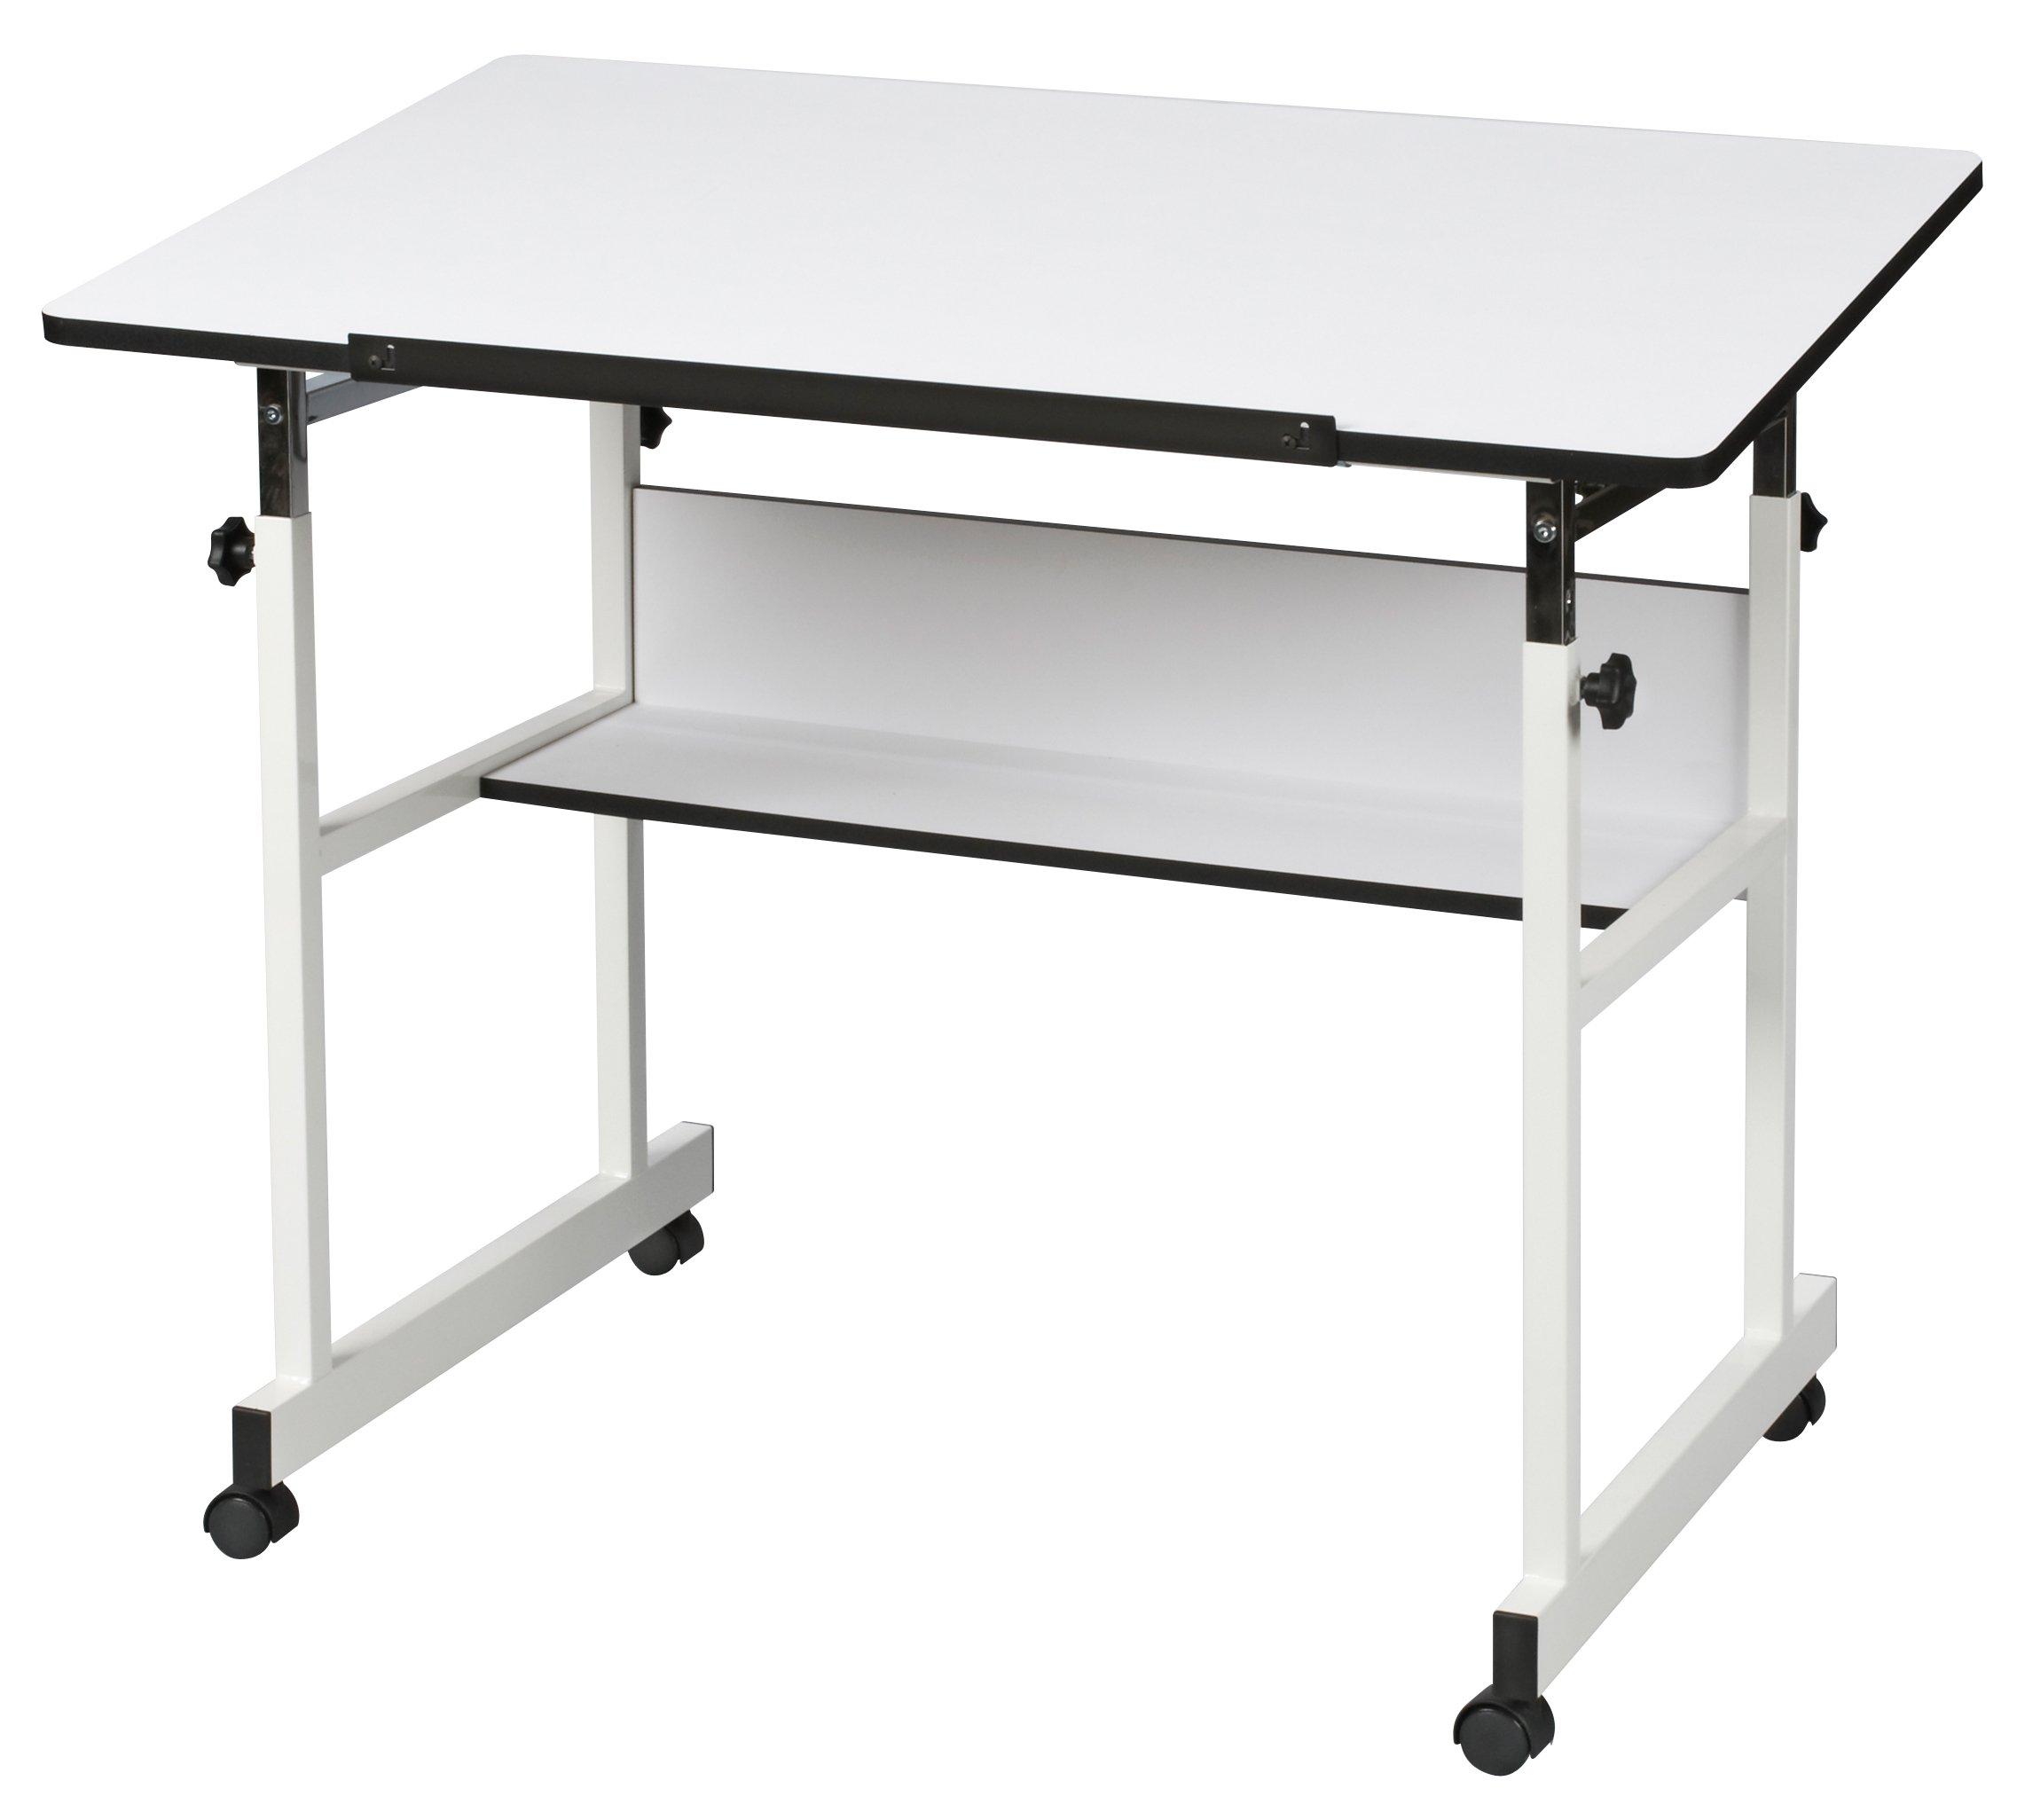 Alvin MM40-4-XB Minimaster II Drafting Table, White